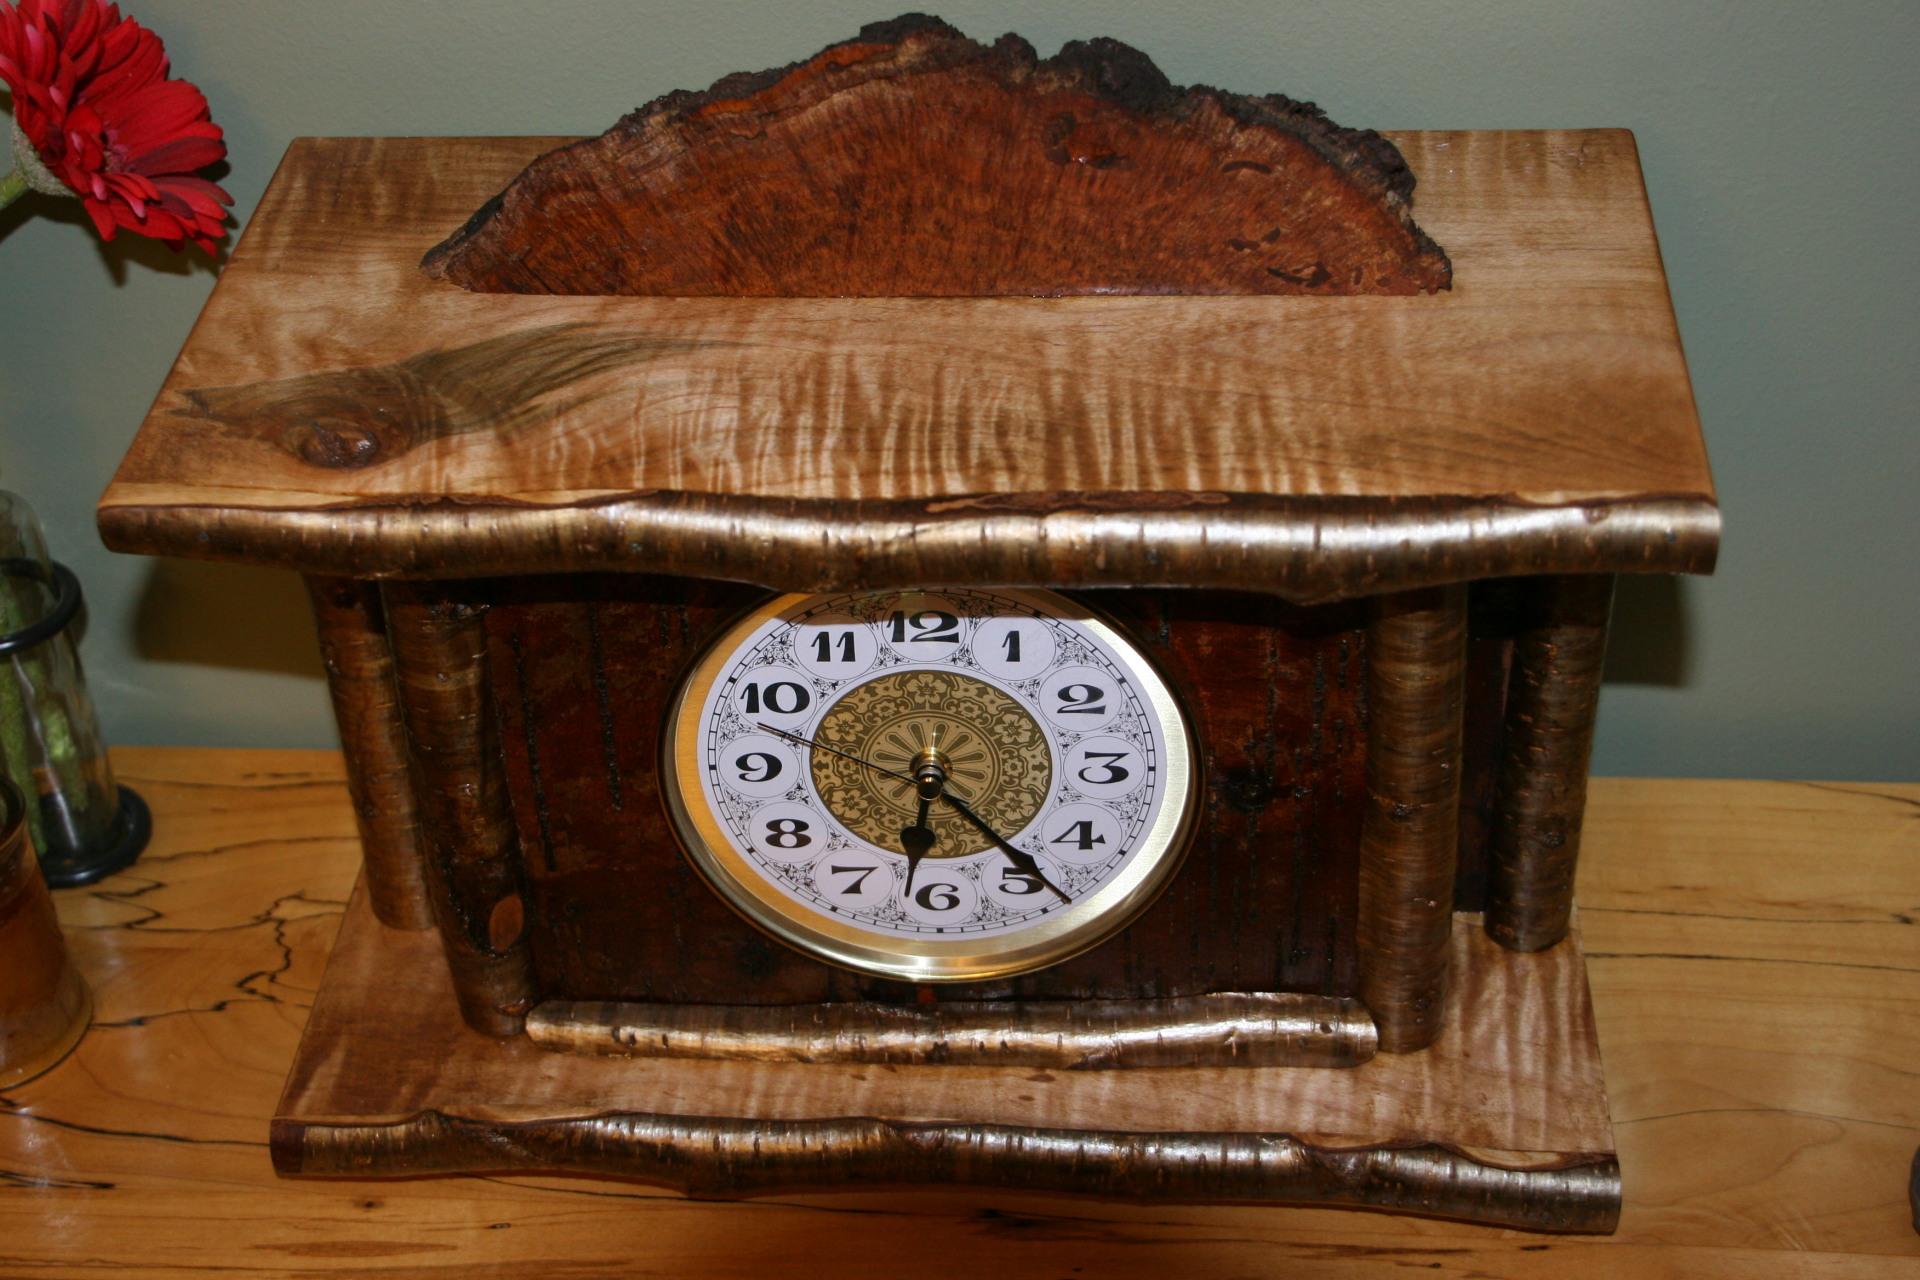 Top View of Clock/Urn